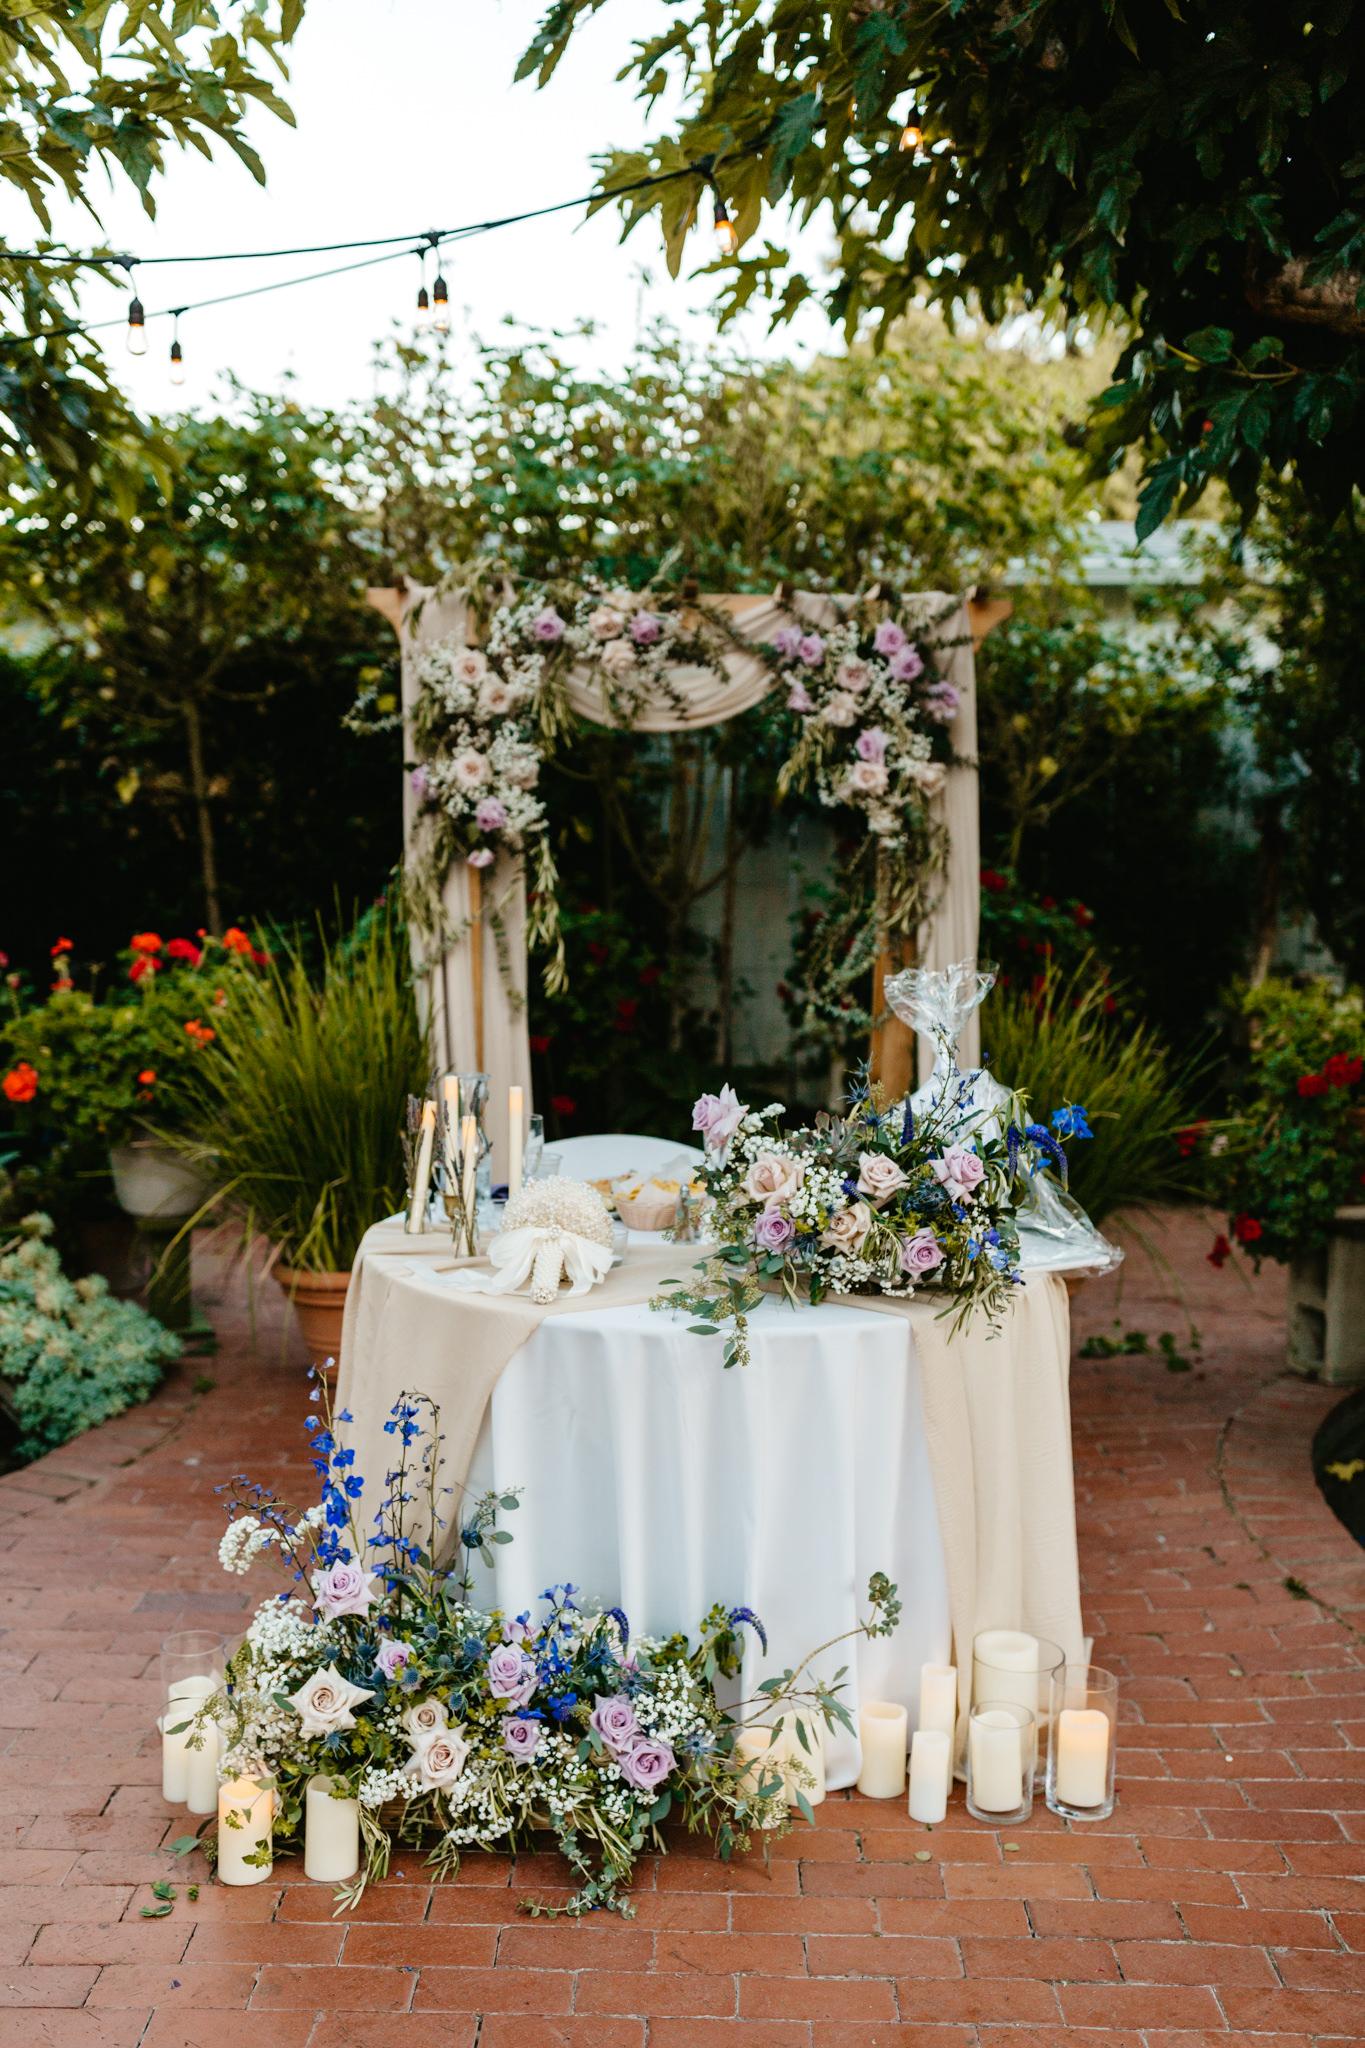 Jardines Outdoor Garden Wedding Reception Table